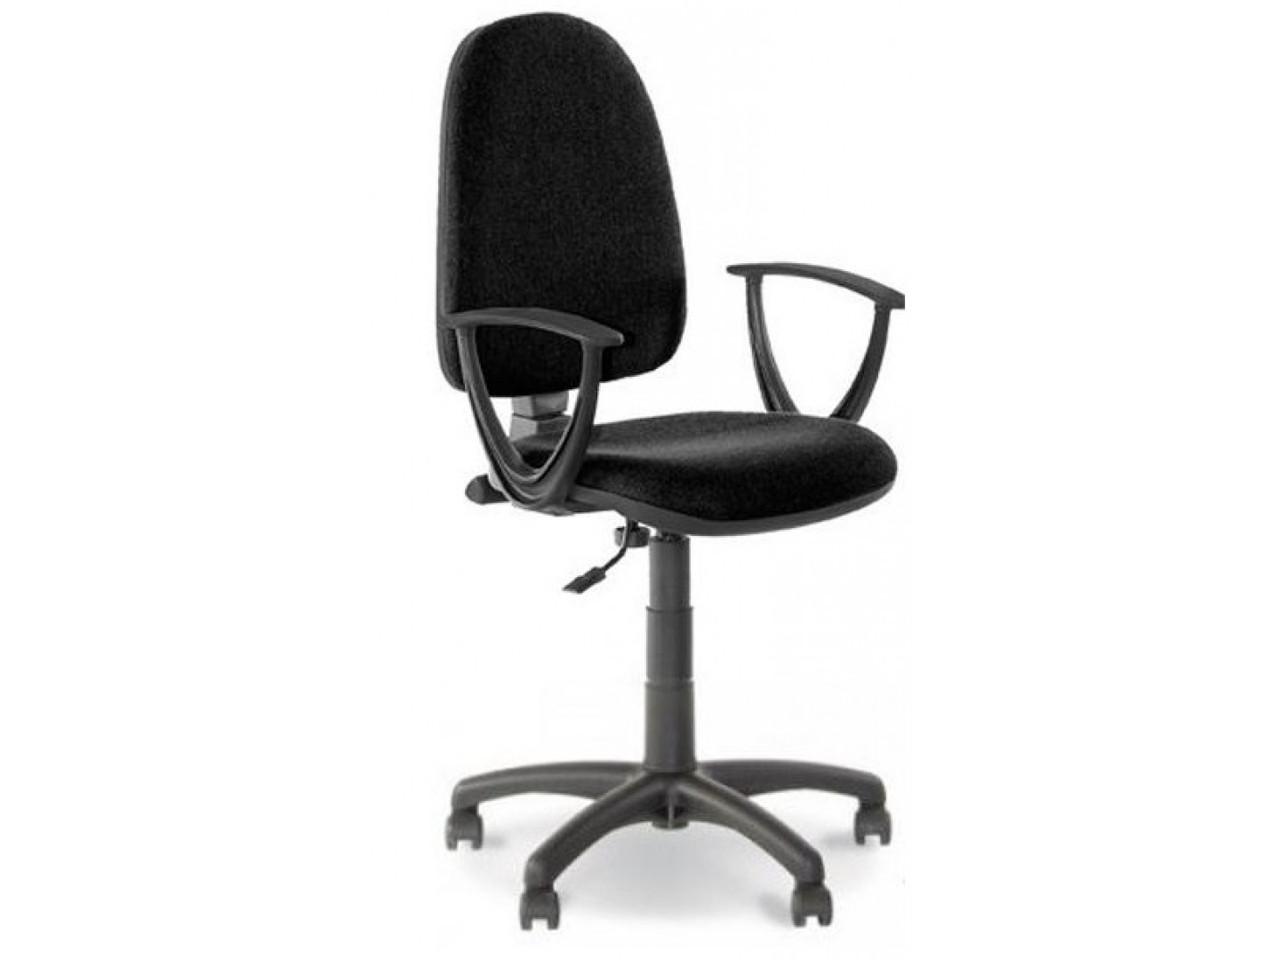 Офисное кресло PRESTIGE II GTP (FI 600) C-11 черное в ткани с подлокотниками от Nowy Styl